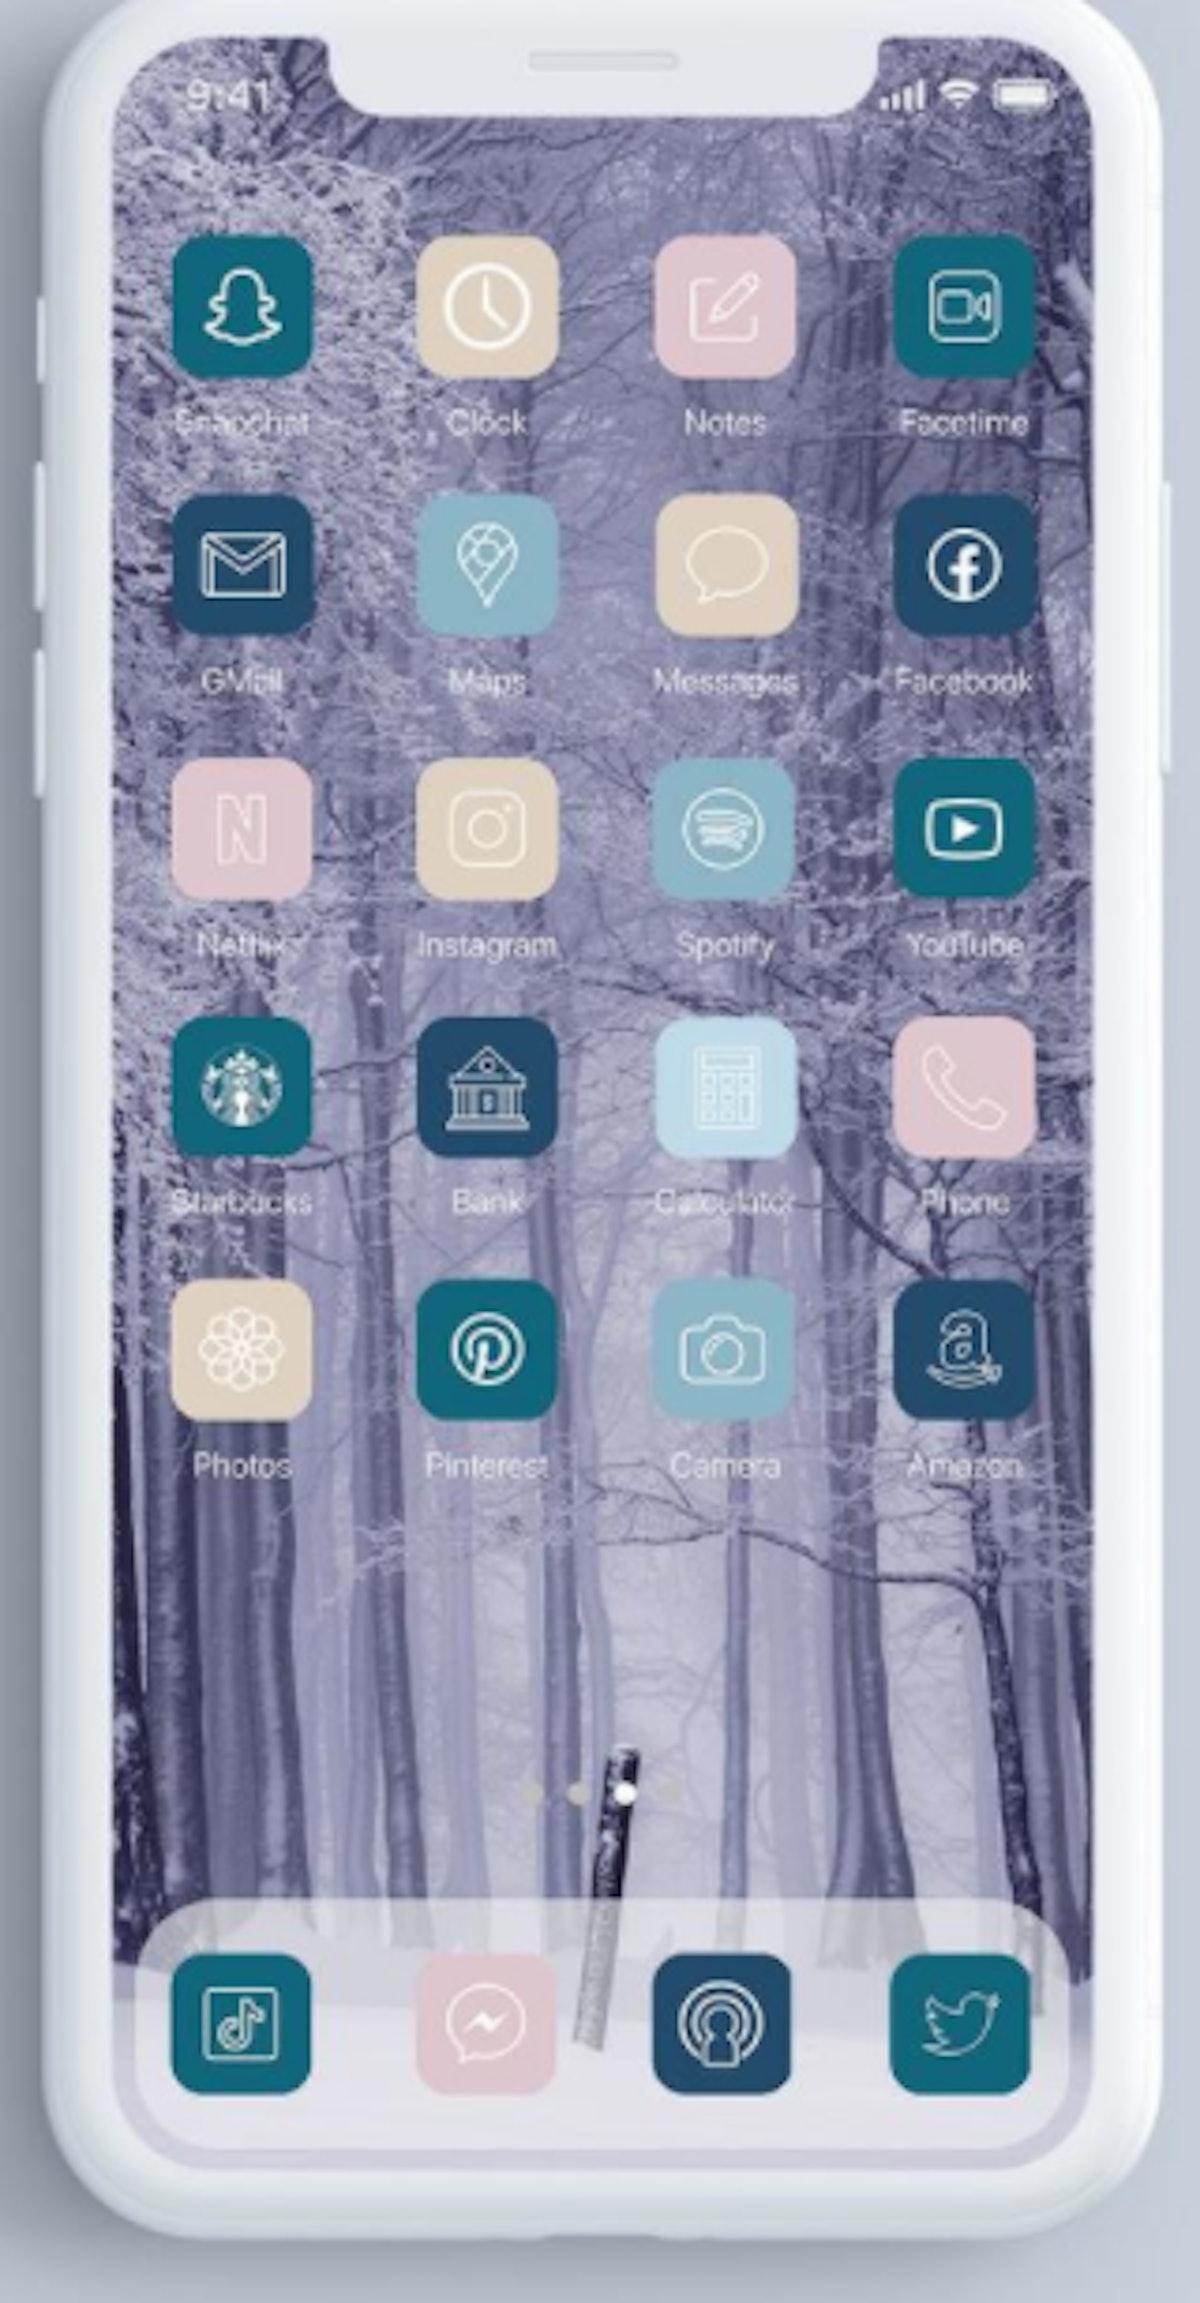 Winter Walk iOS 14 Home Screen Design Pack